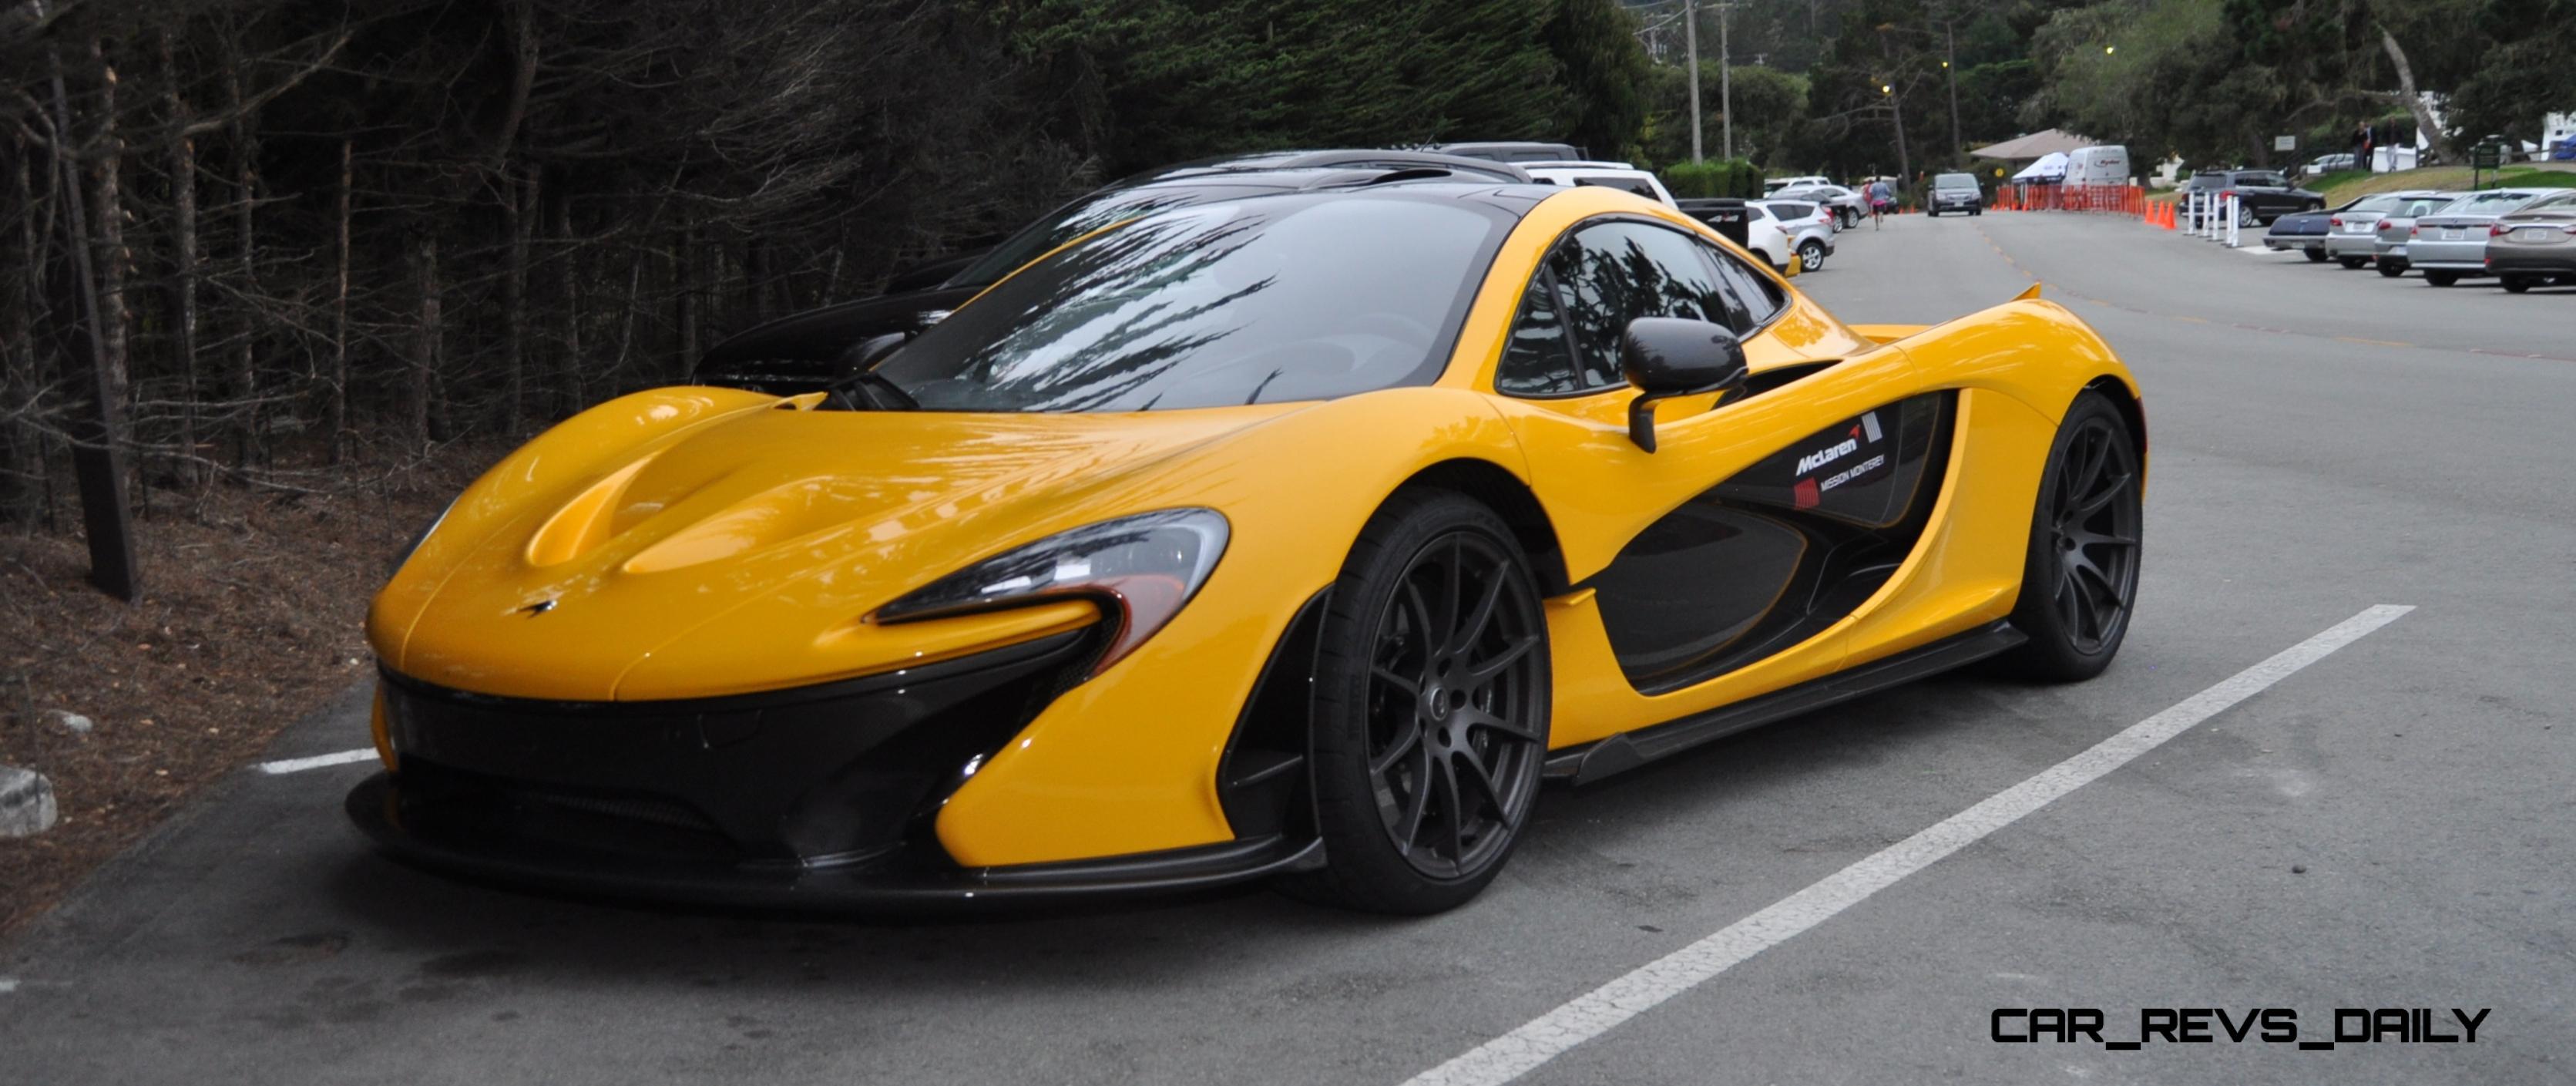 McLaren P1 Mission Monterey is Million Dollar Overnight Hypercar